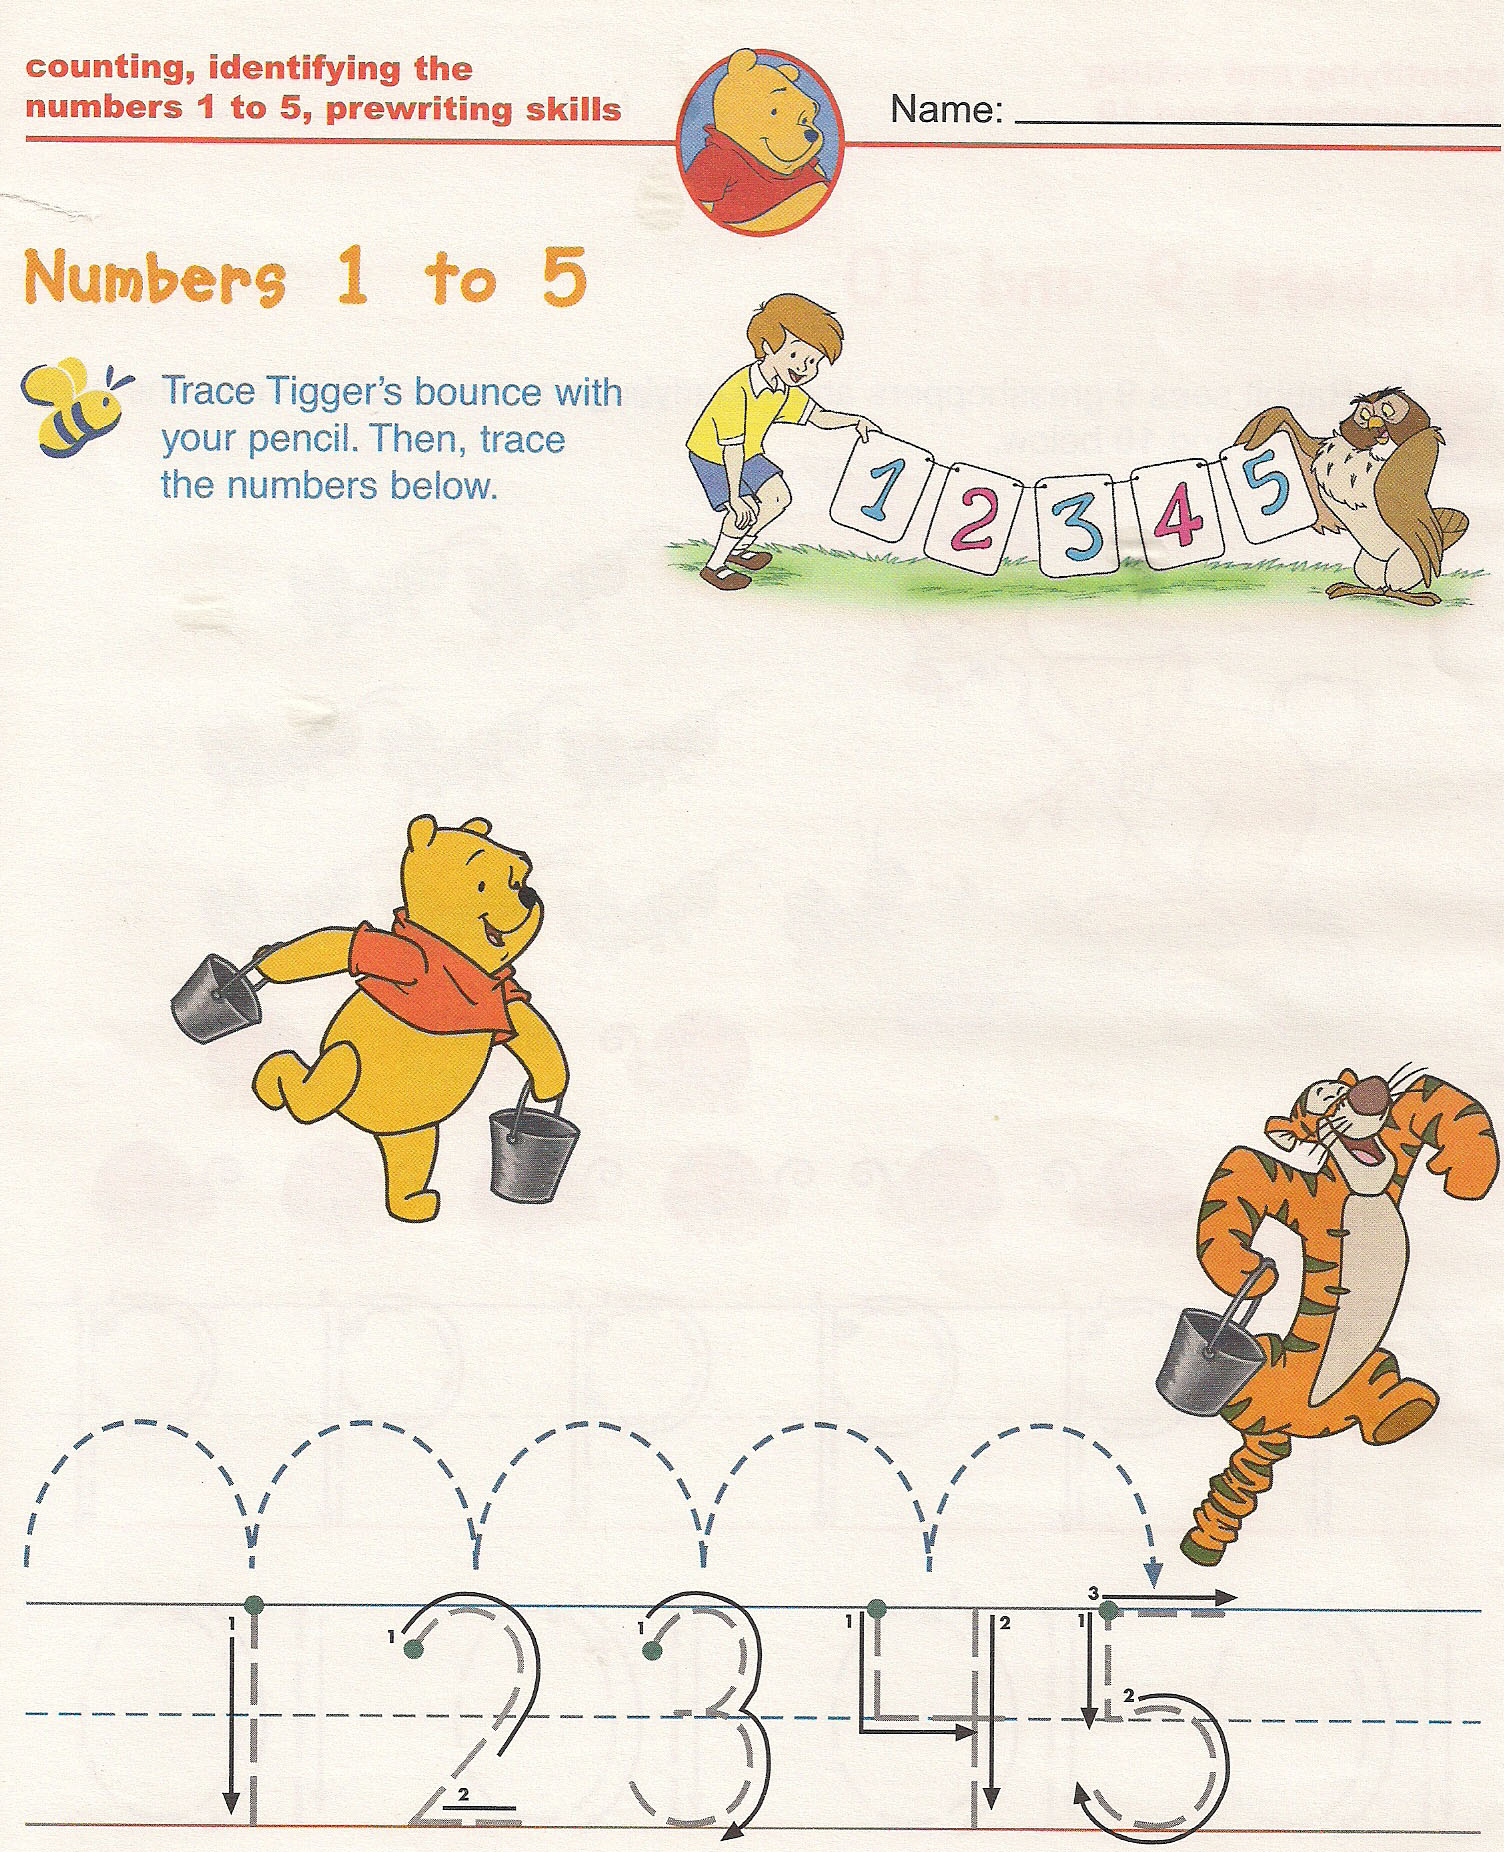 Counting Number Math Worksheets For Kindergarten Kids Free Printable Images